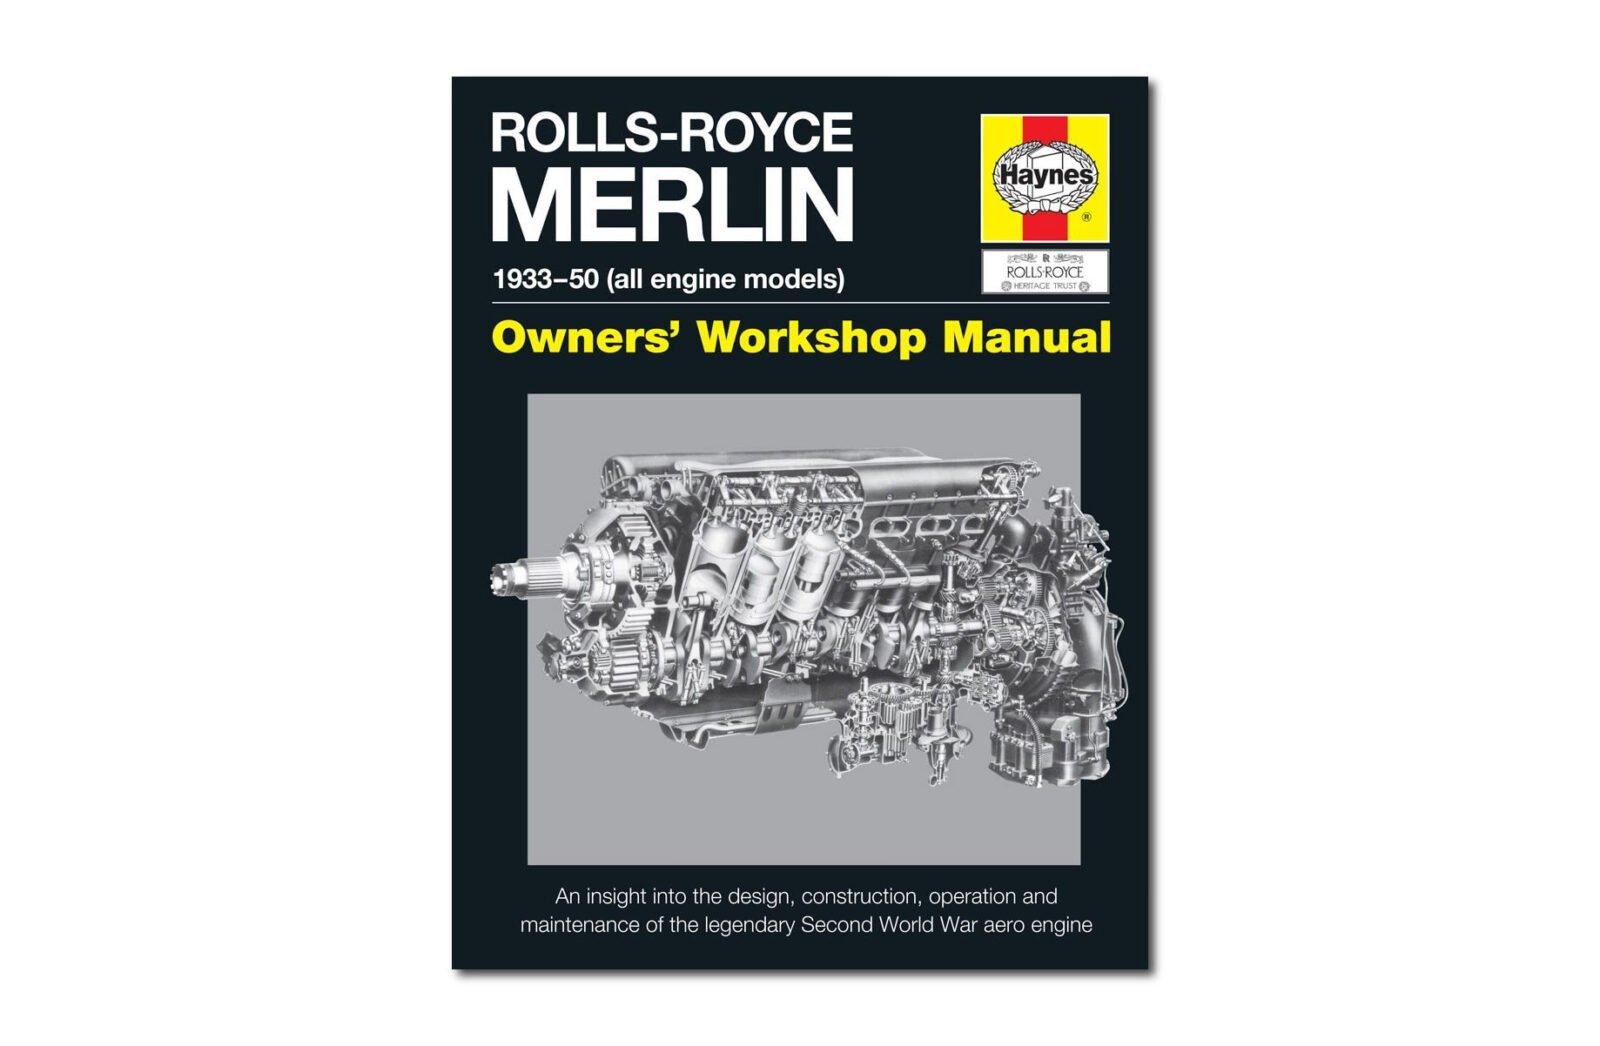 Rolls Royce Merlin Owners Workshop Manual 1600x1046 - Rolls-Royce Merlin Owner's Workshop Manual